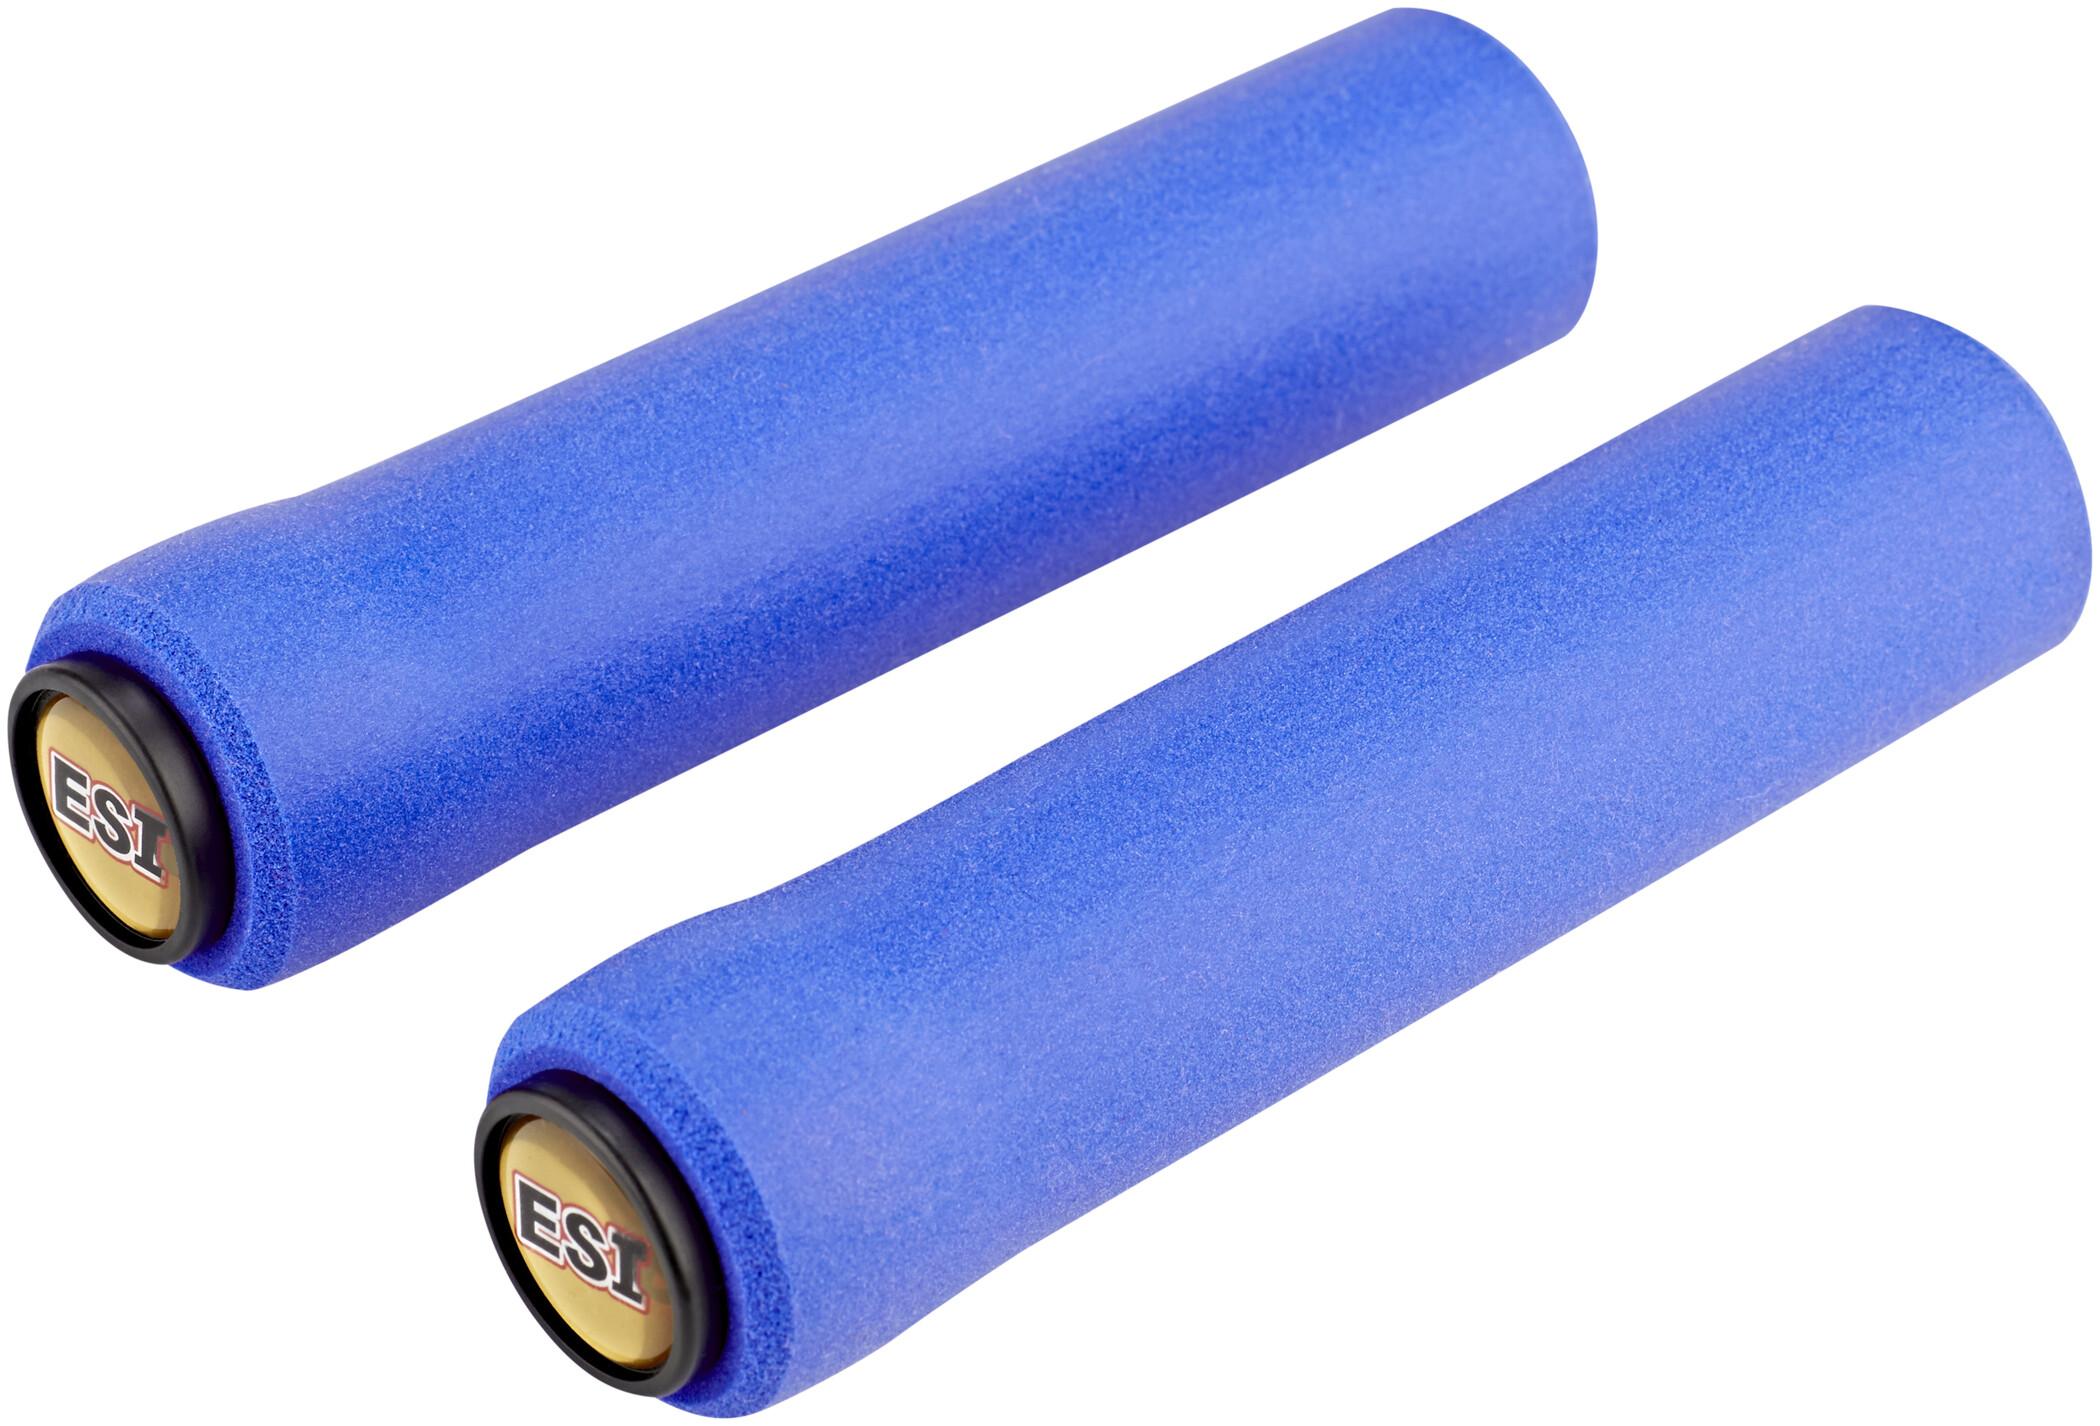 ESI Chunky Greb, blue (2019)   Handles